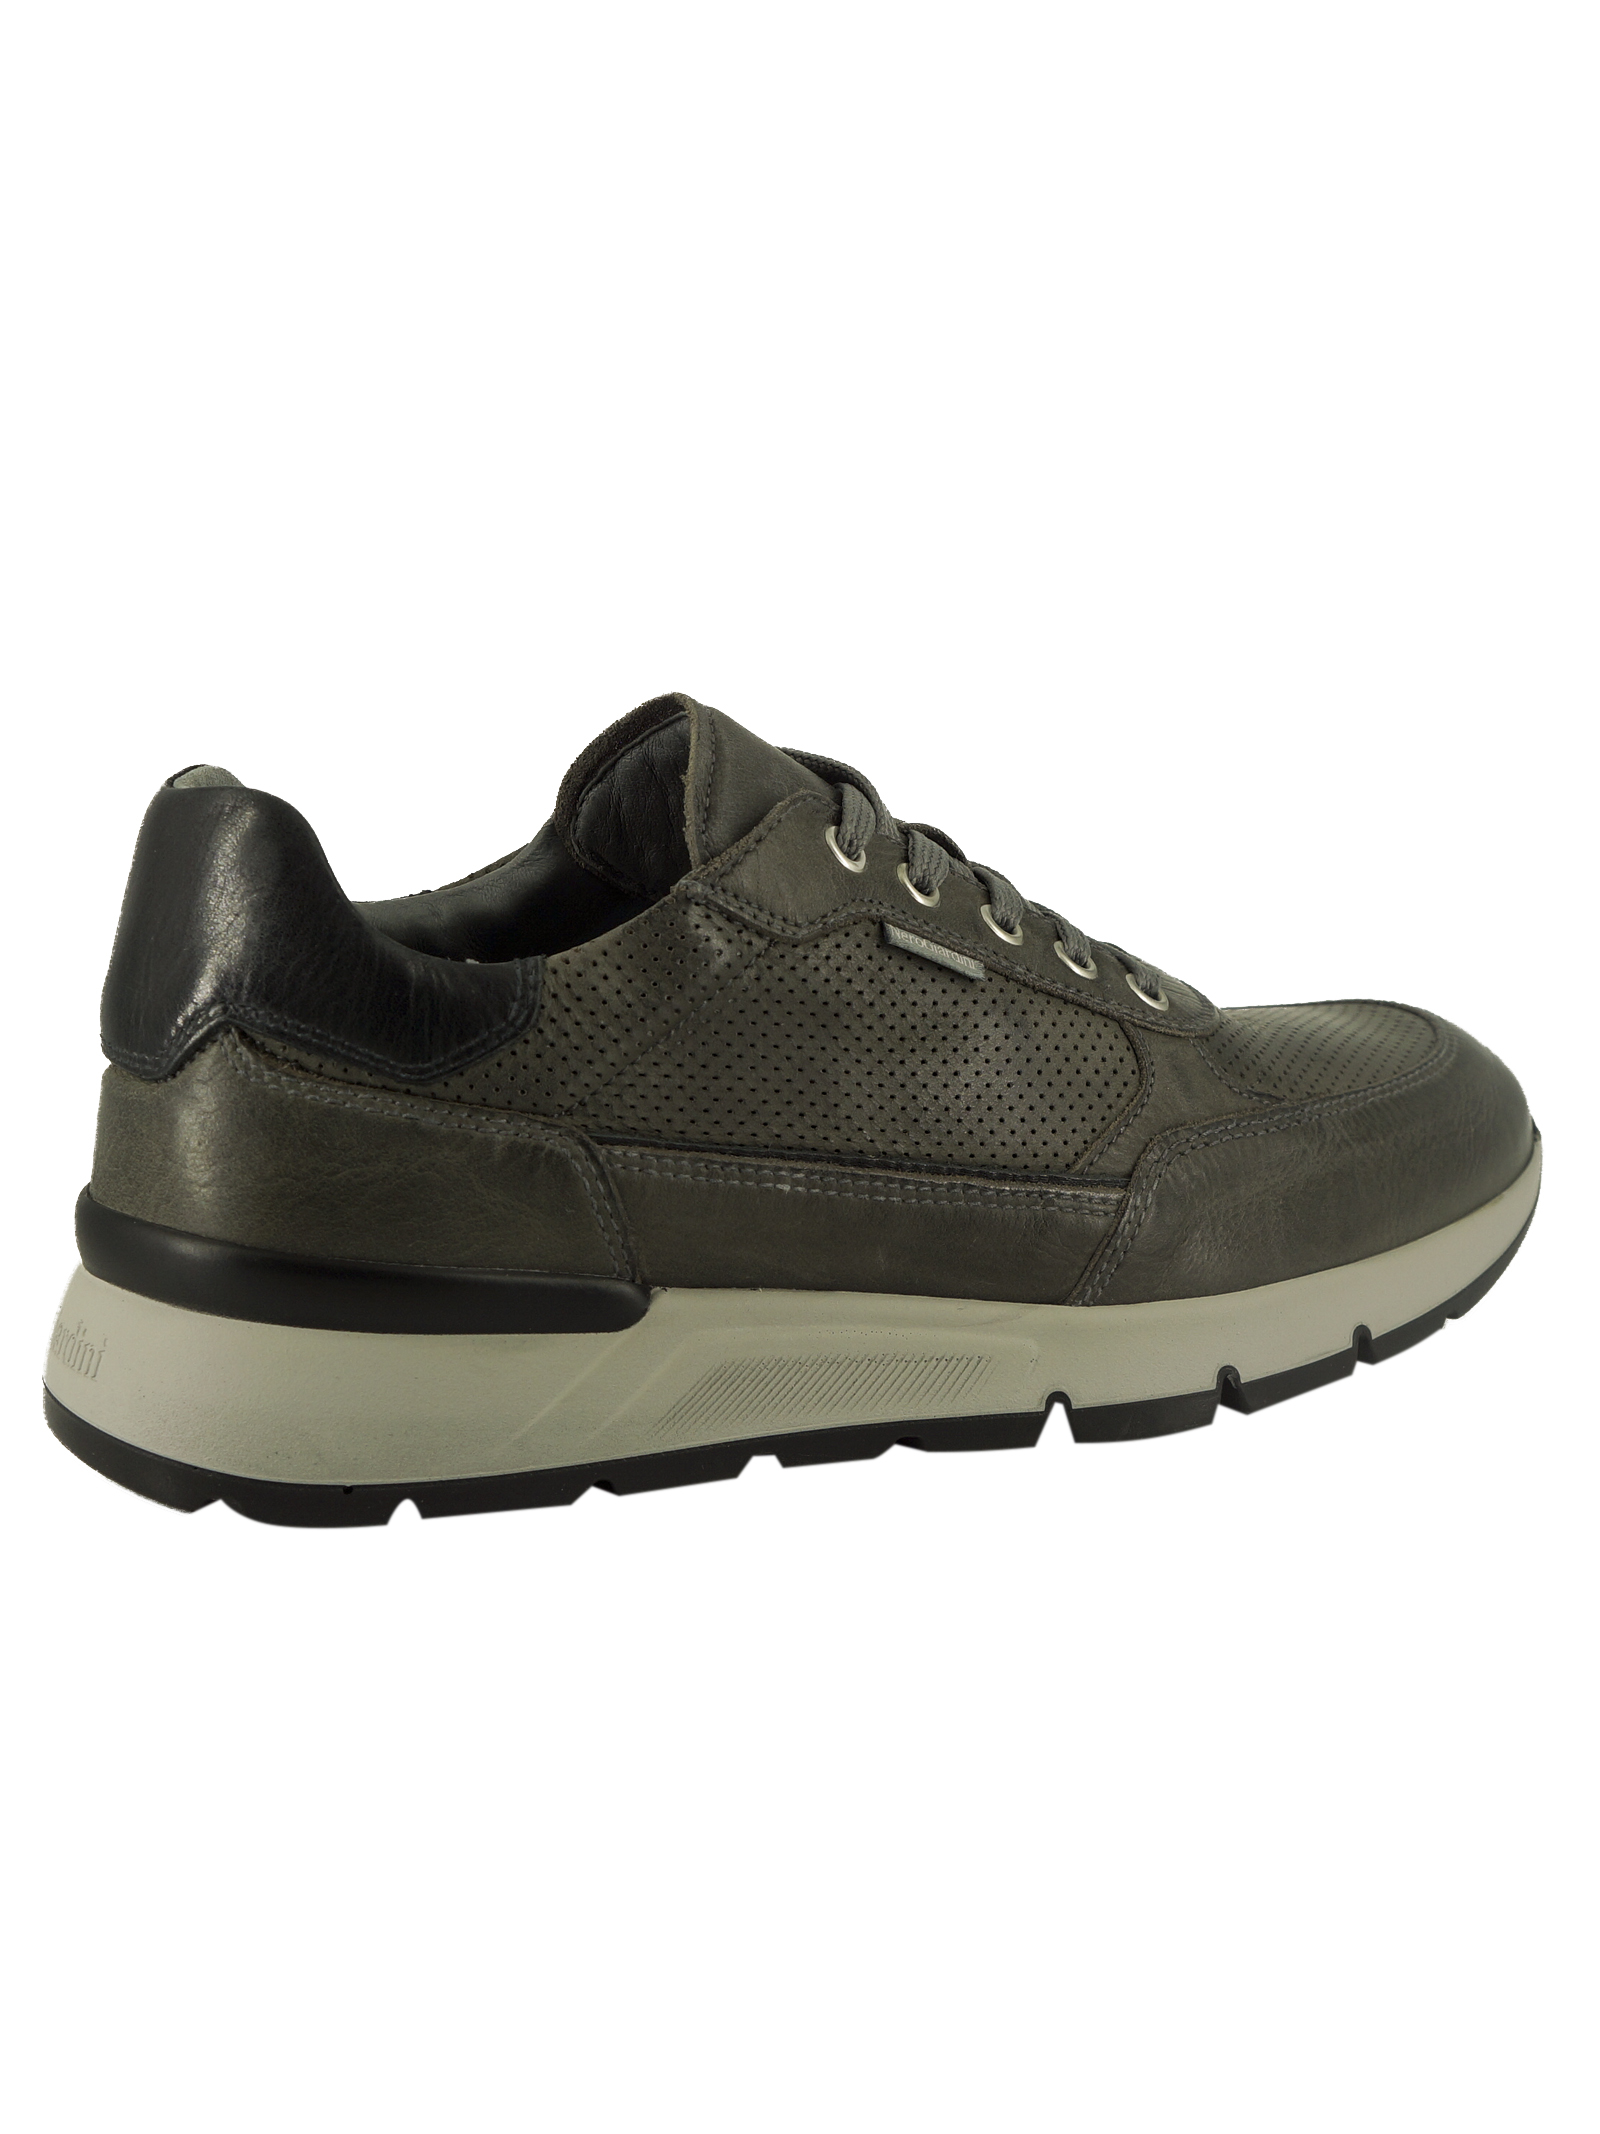 SNEAKERS Nero Giardini | Sneakers | E101991UGRIGIO105